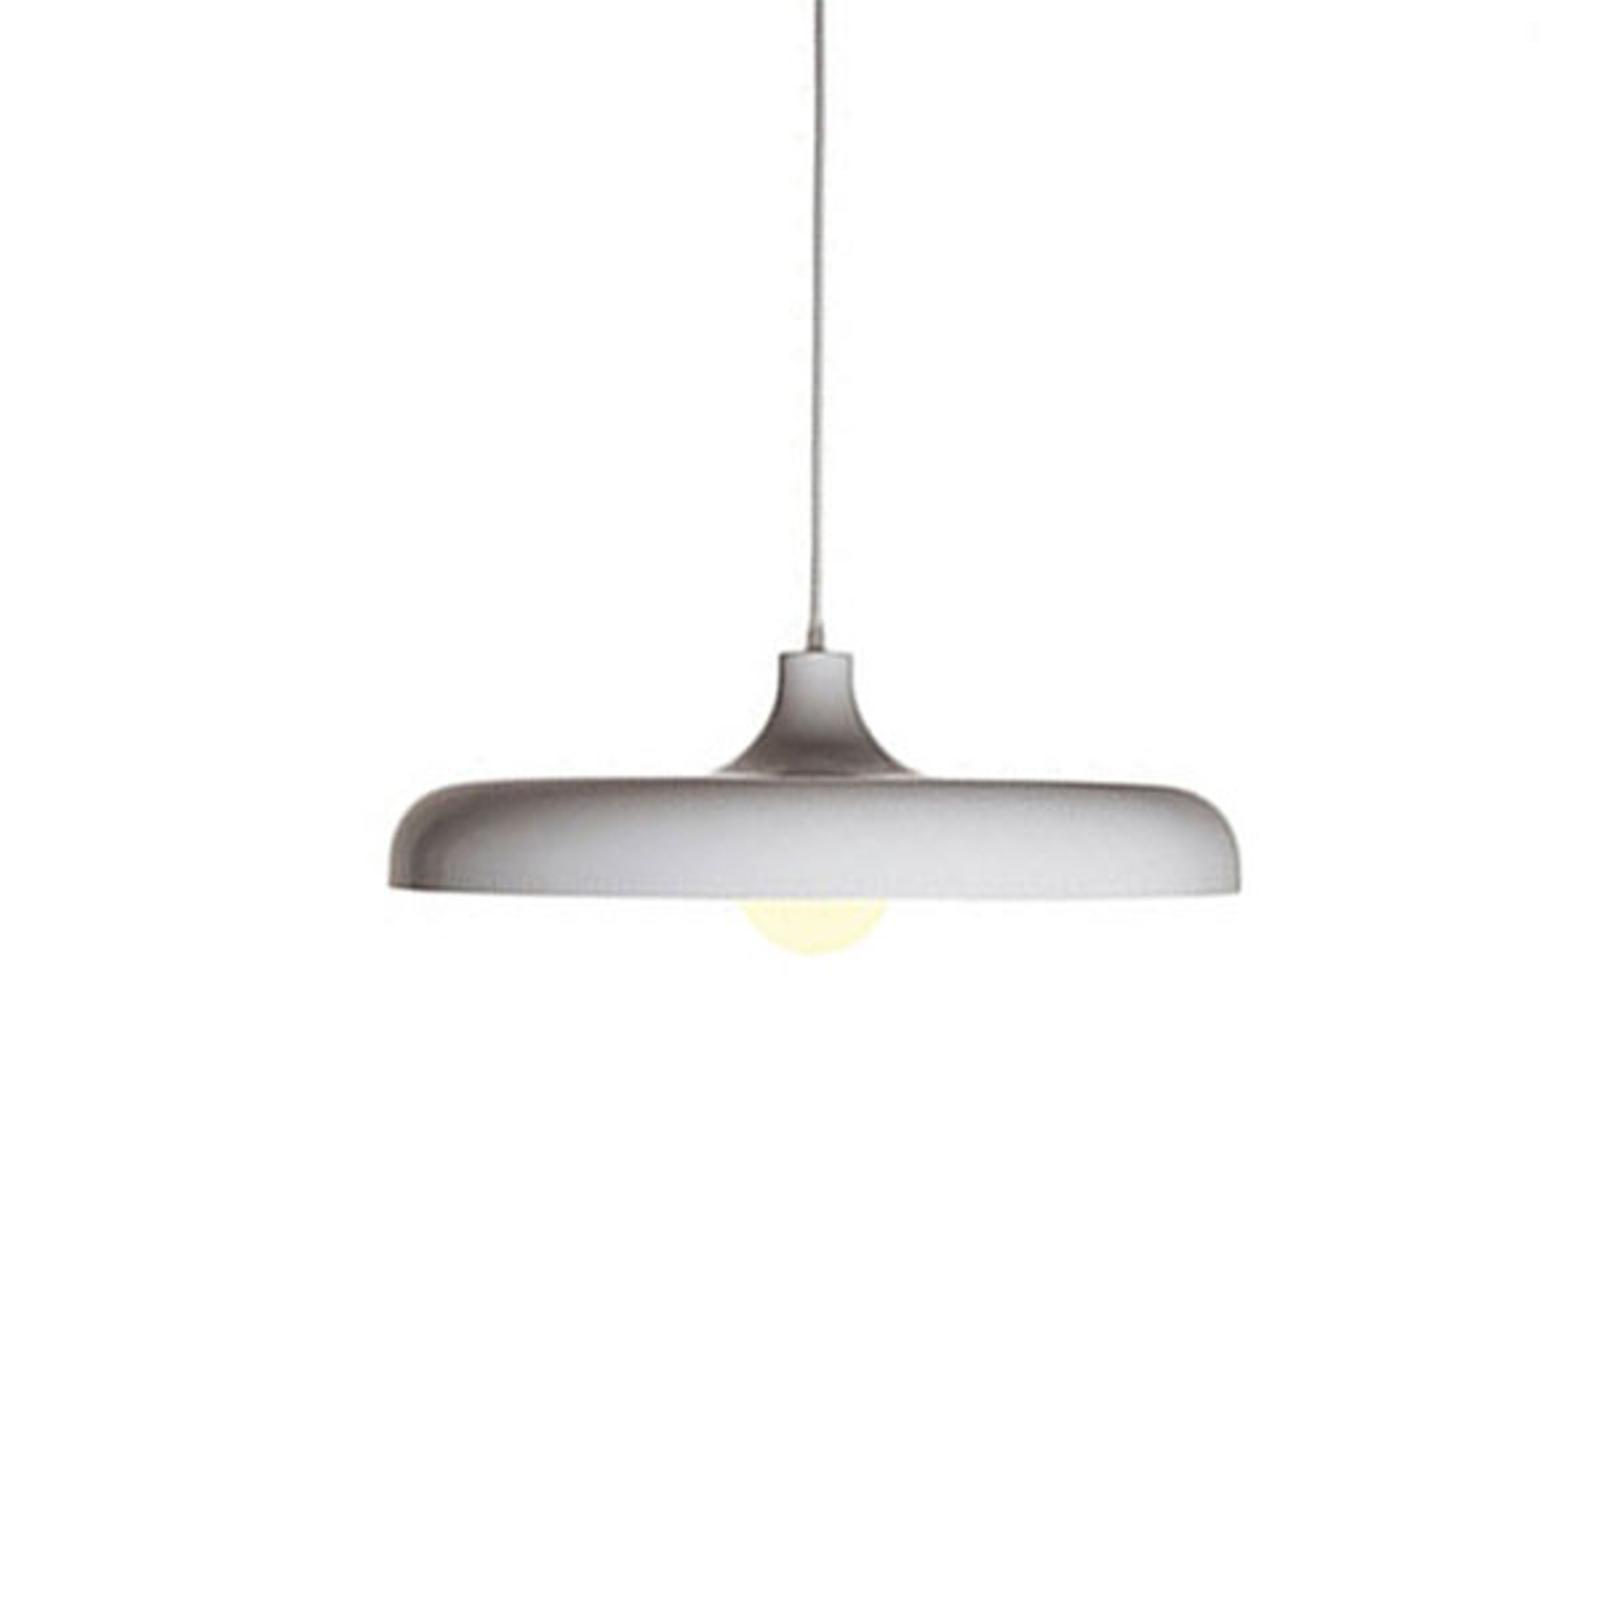 Innermost Portobello - hanglamp Ø 49cm wit